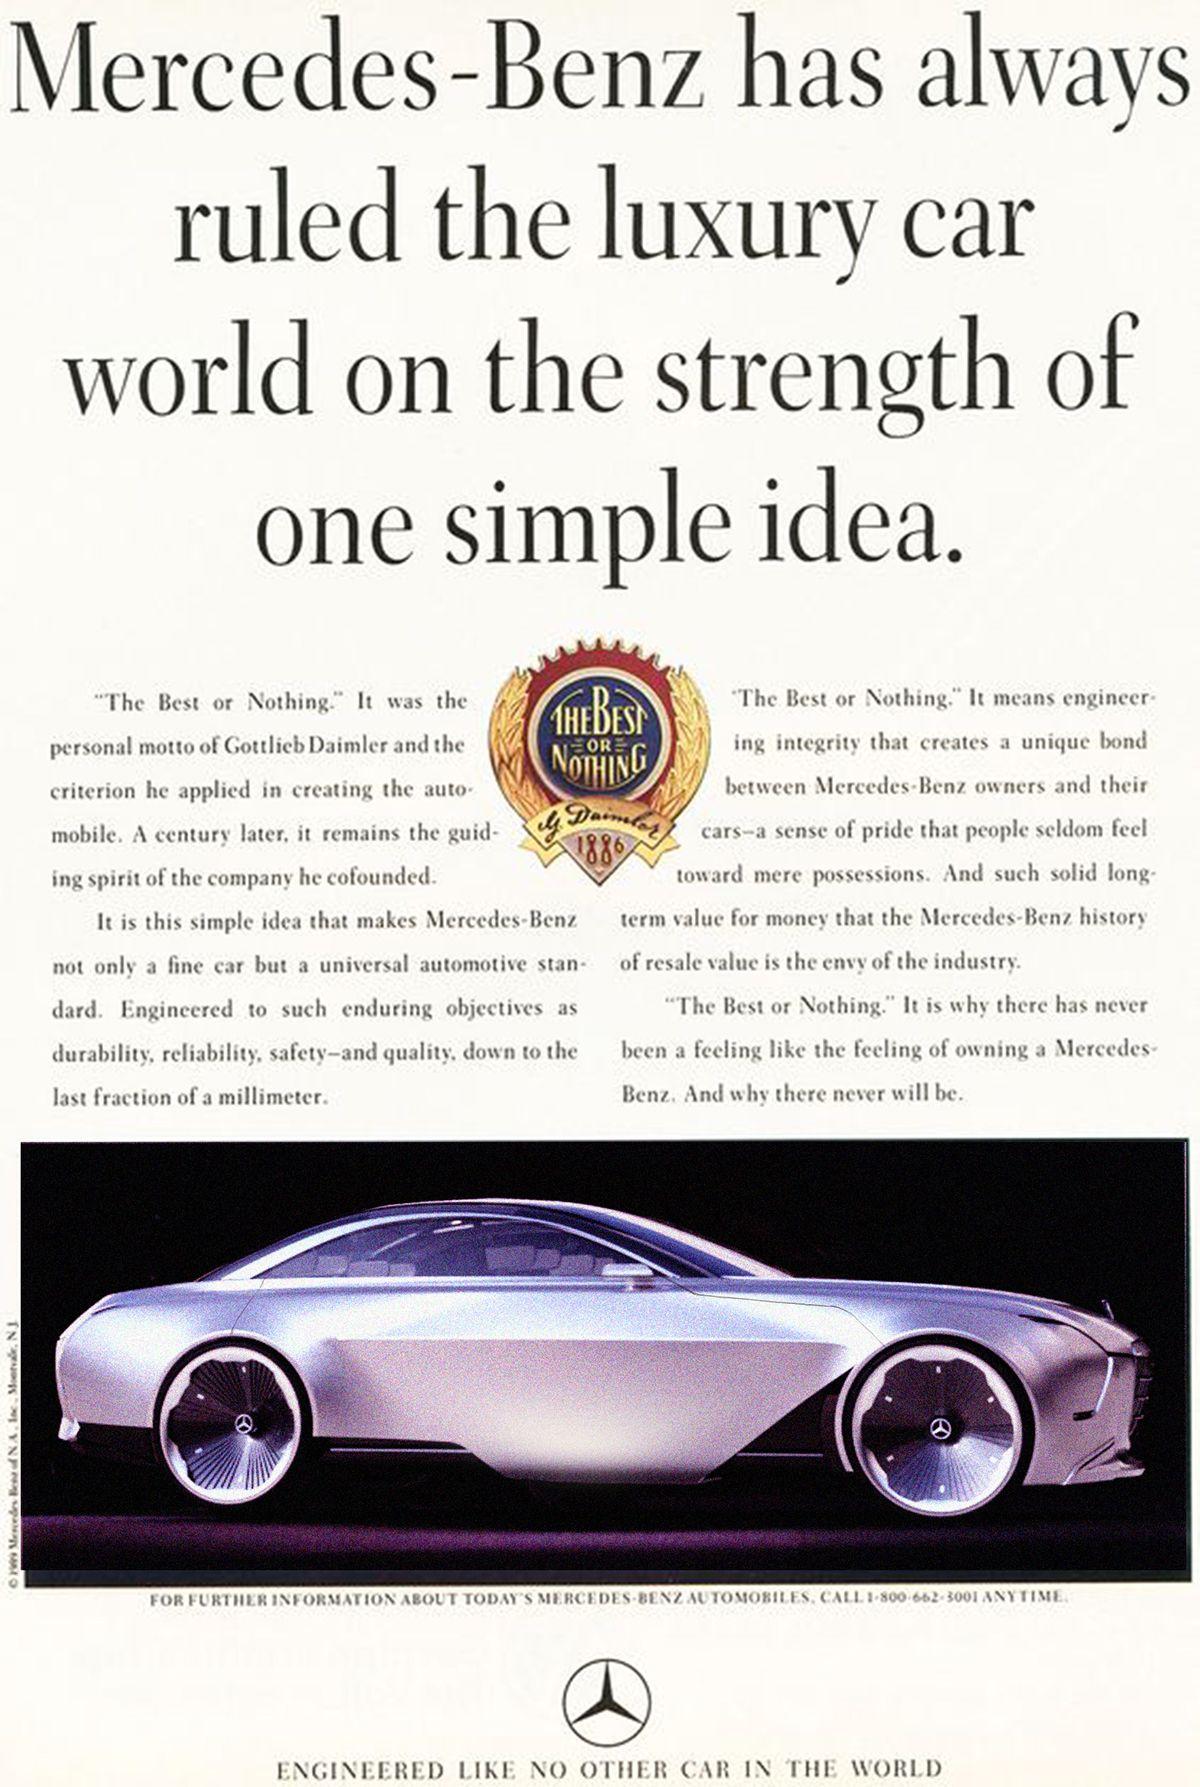 makopirujezmrdzapadnarski | E X T E R I O R | Pinterest | Automotive ...